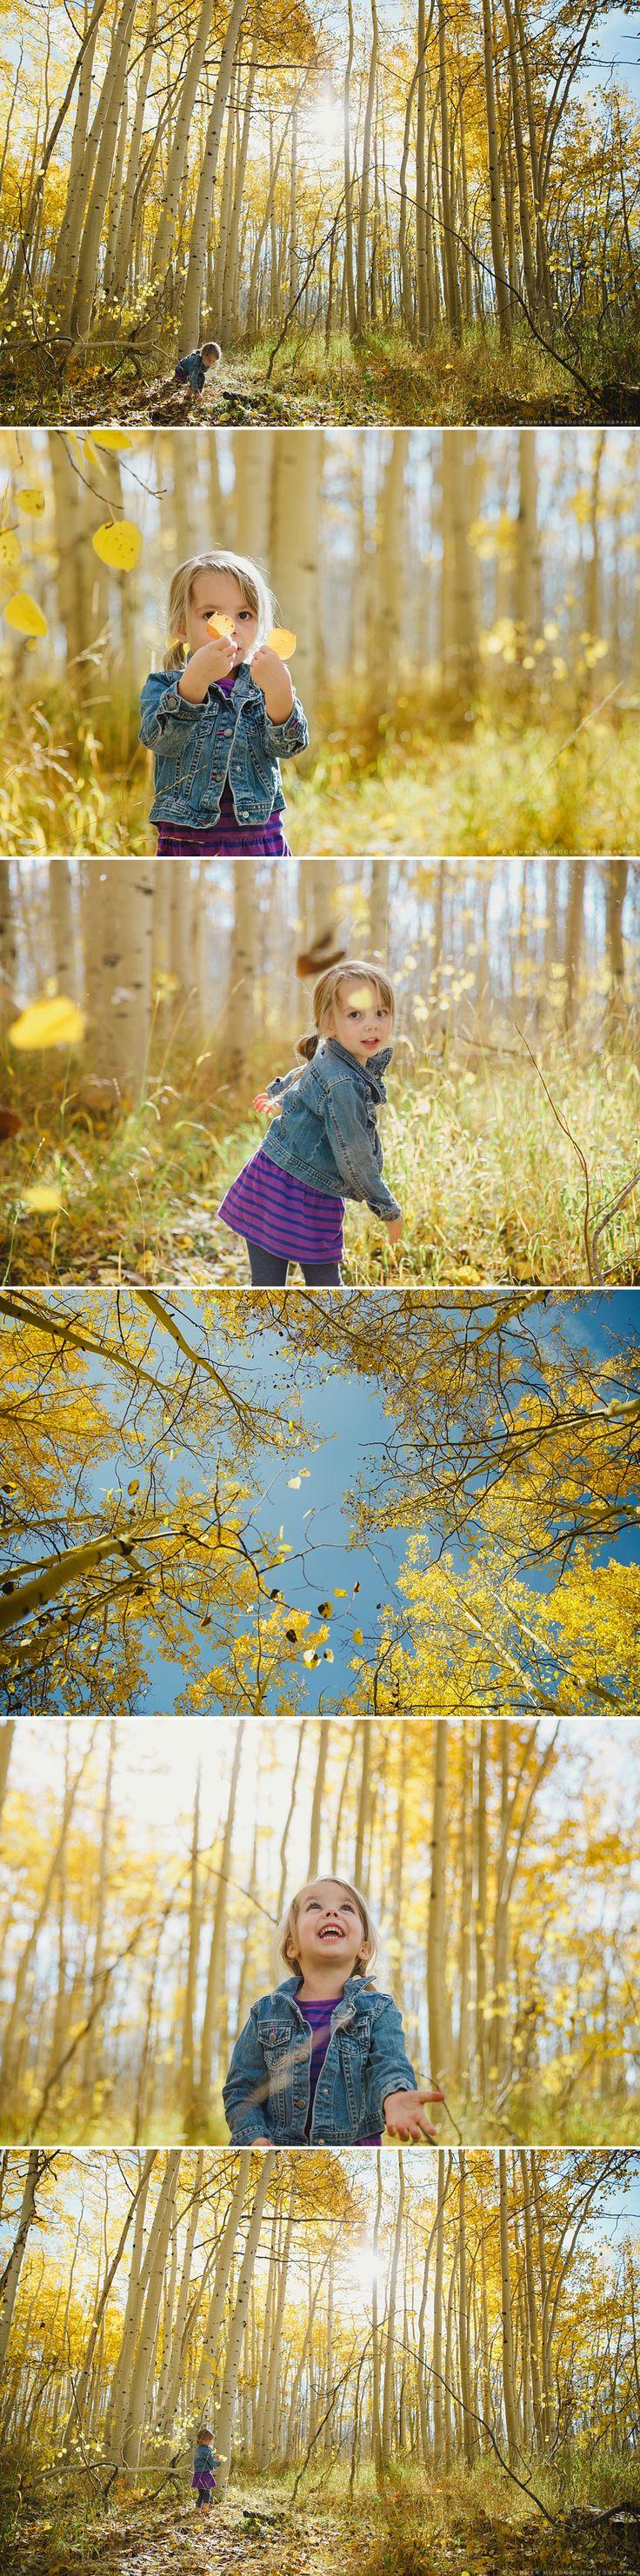 Summer Murdock Photography, Salt Lake City Utah Family Photographer, 5 minute project, aspen grove, fall